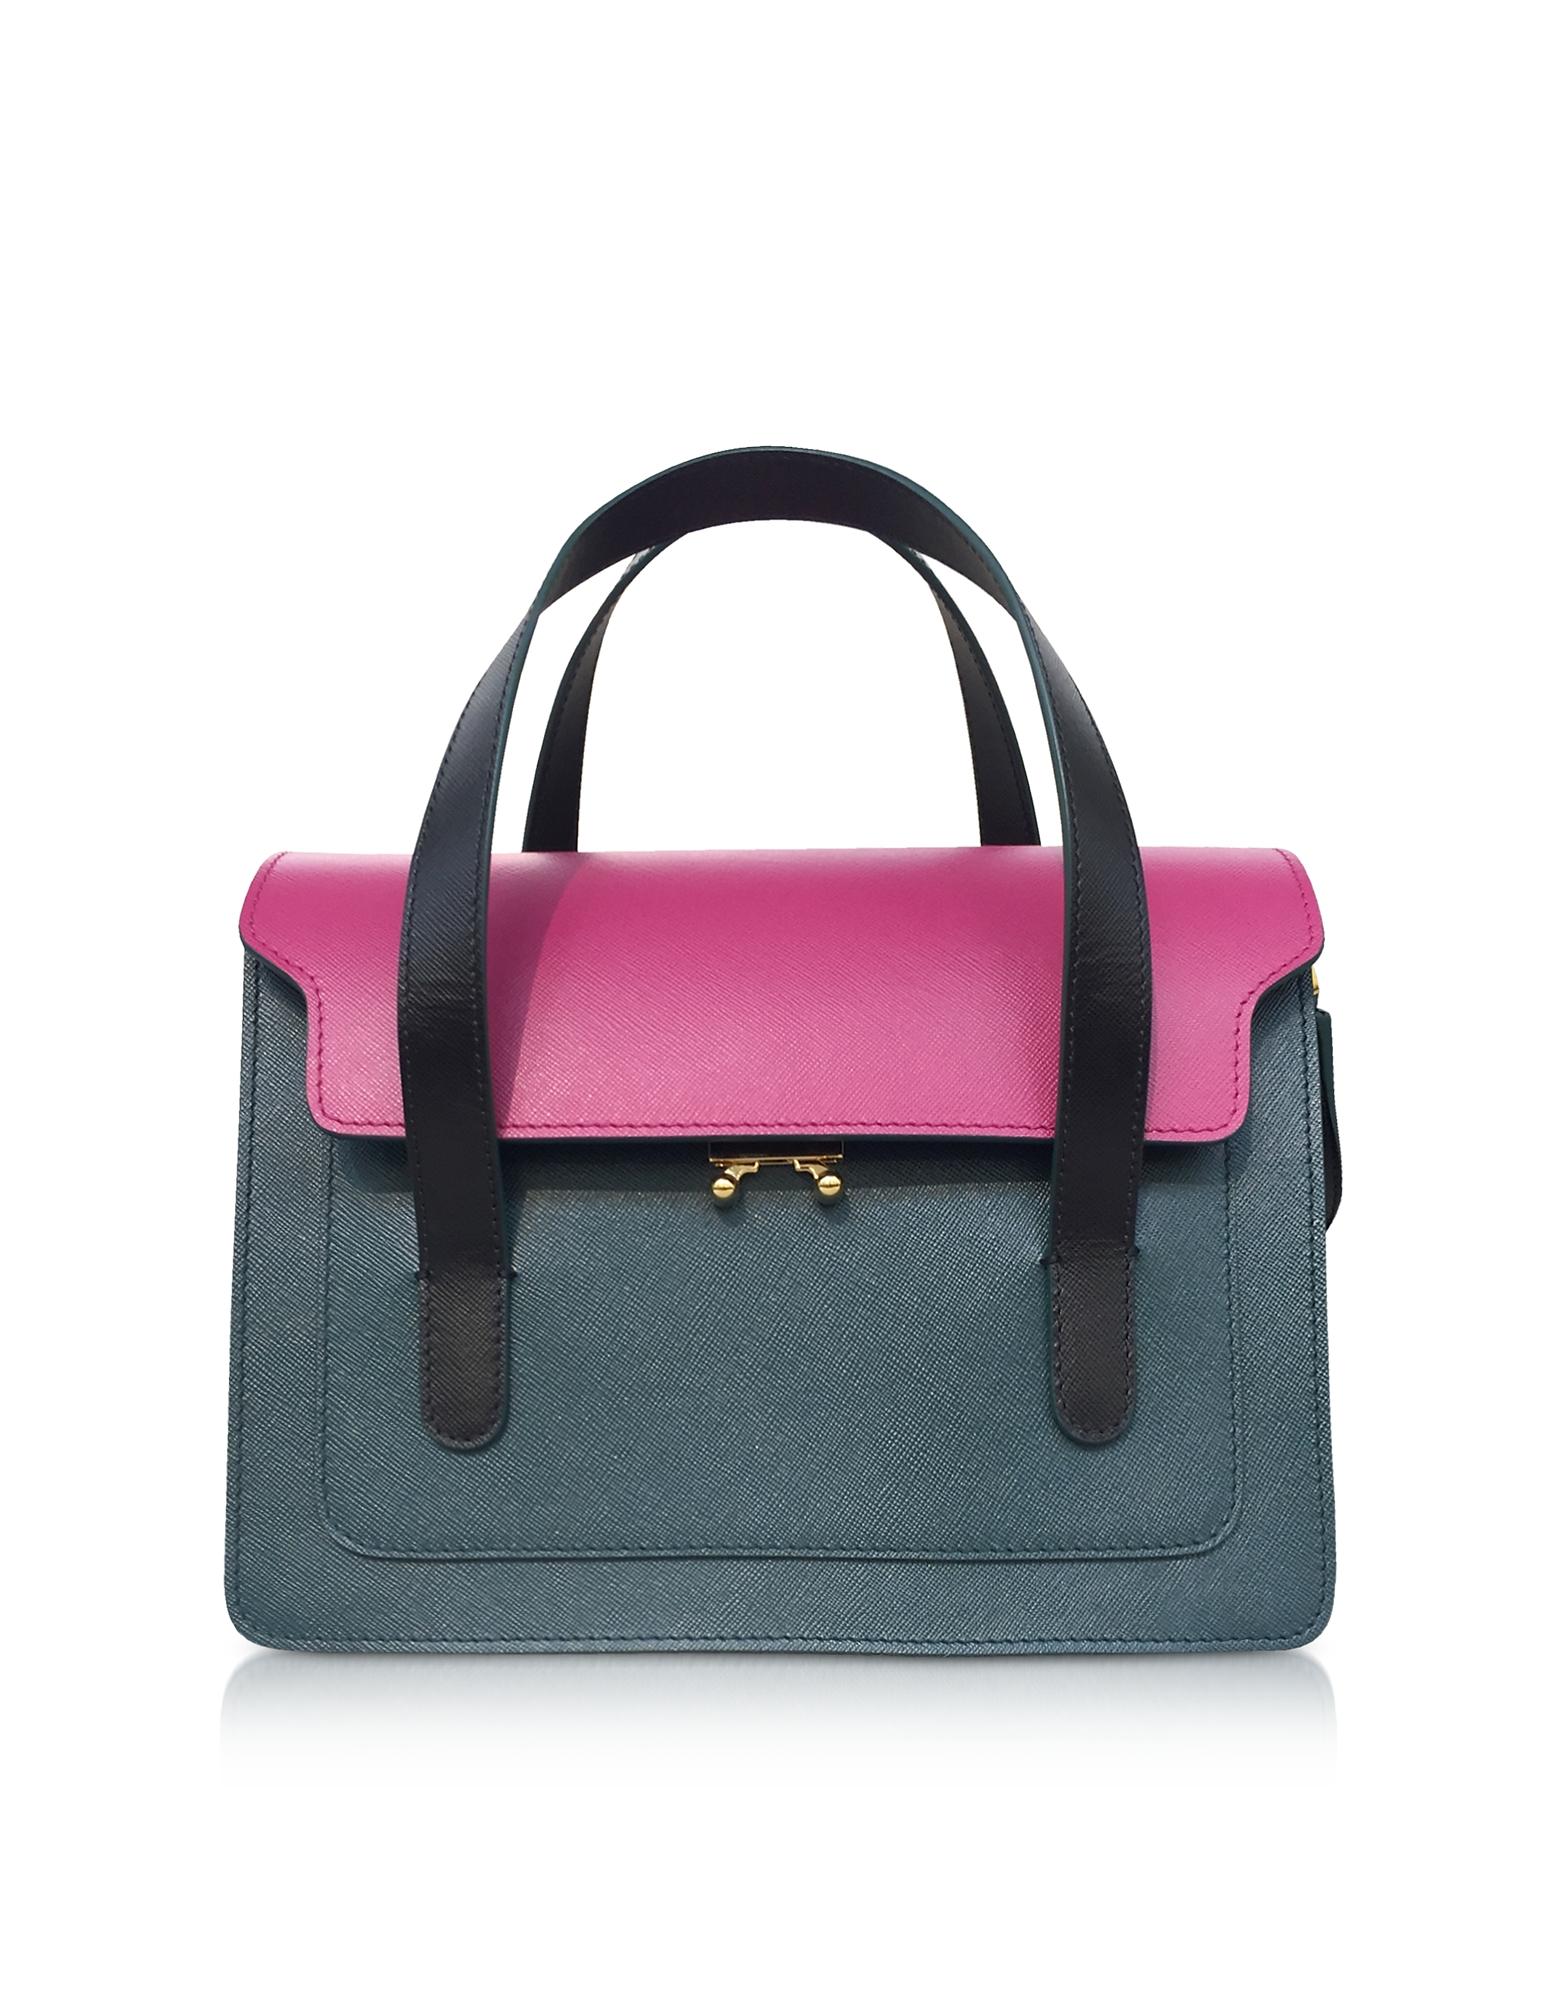 Marni Handbags, Cassis, Petroleum and Black Leather Satchel Bag w/Shoulder Strap